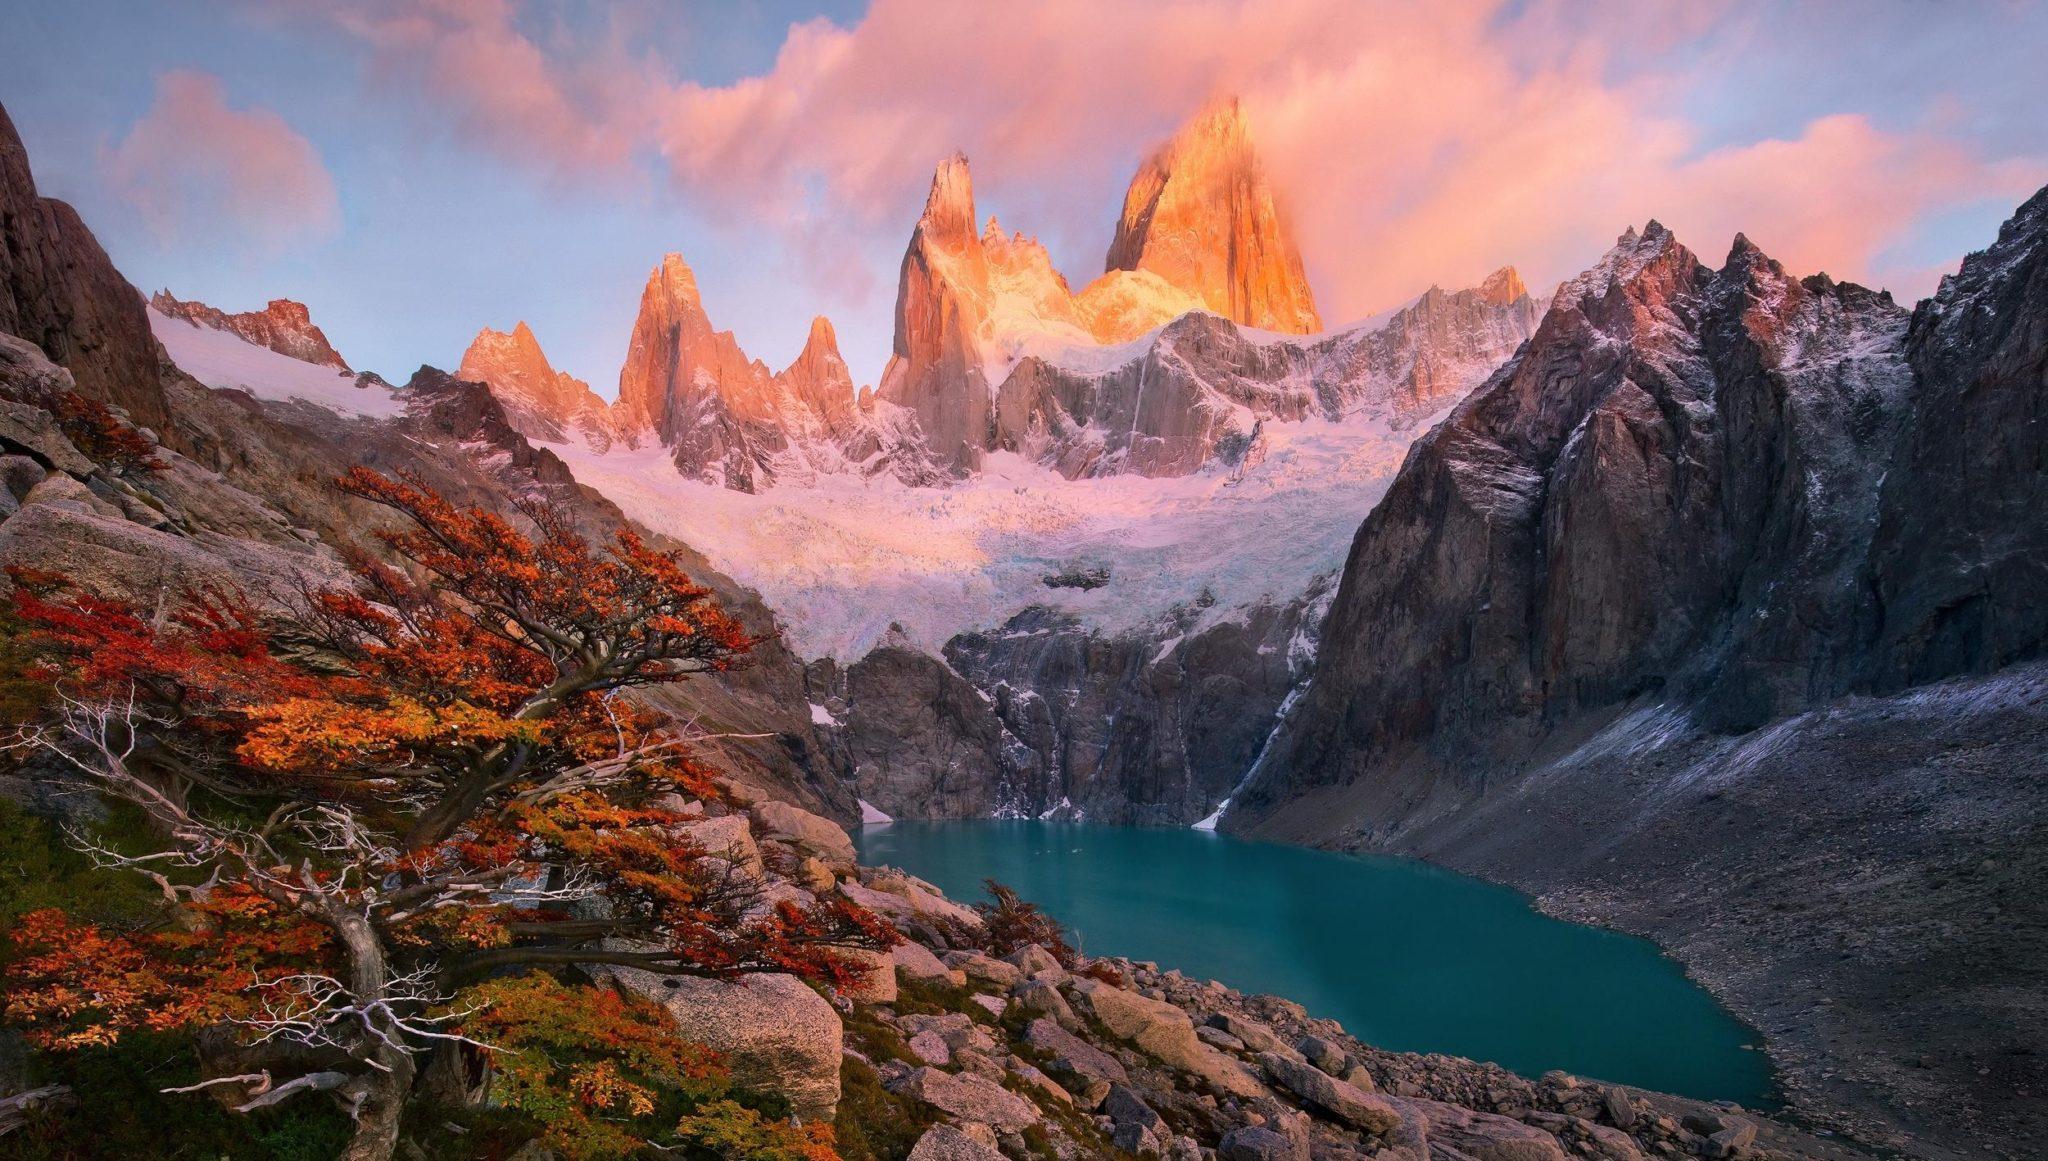 patagonia - photo #13